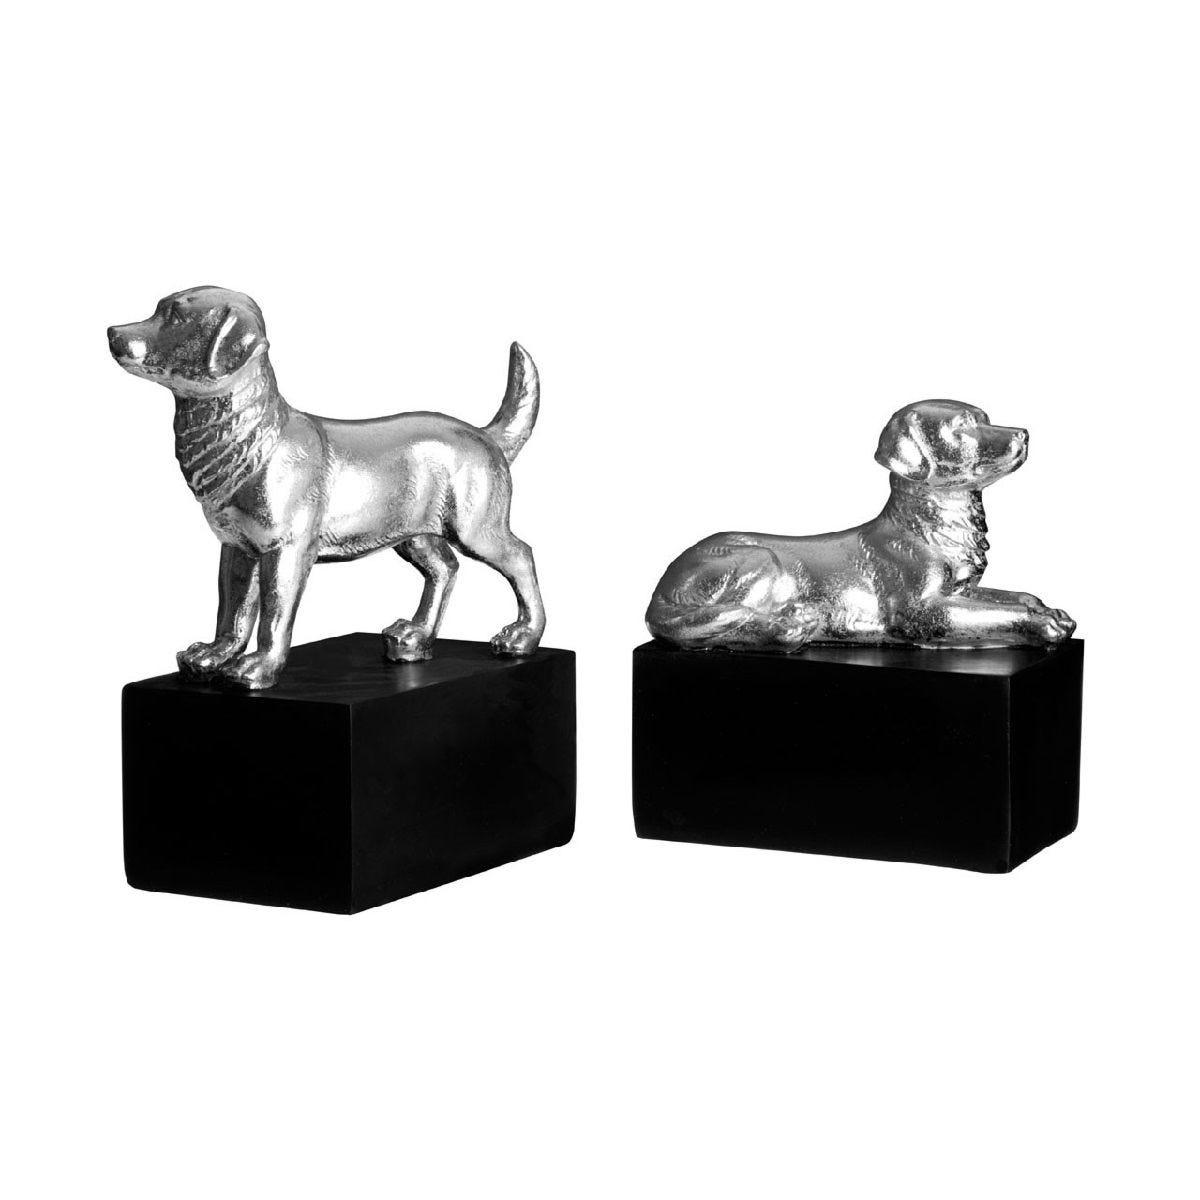 Premier Housewares Set of 2 Dog Bookends - Polyresin Silver/Black